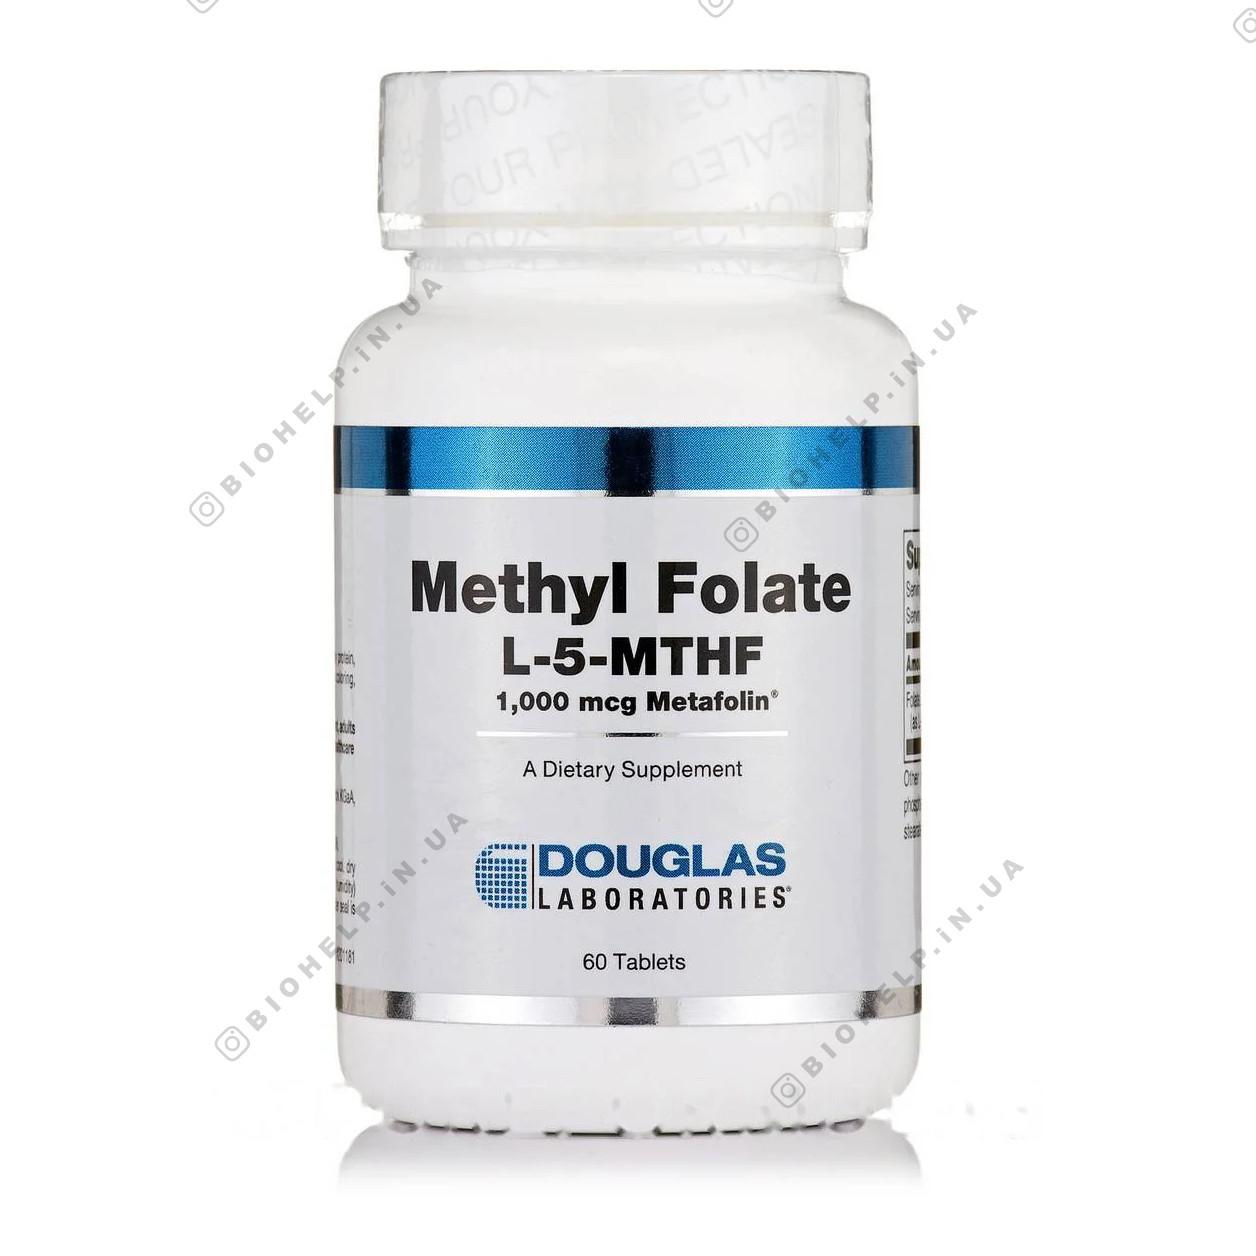 Метил-Фолат L-5-MTHF, Methyl Folate L-5-MTHF, Douglas Laboratories, 60 таблеток